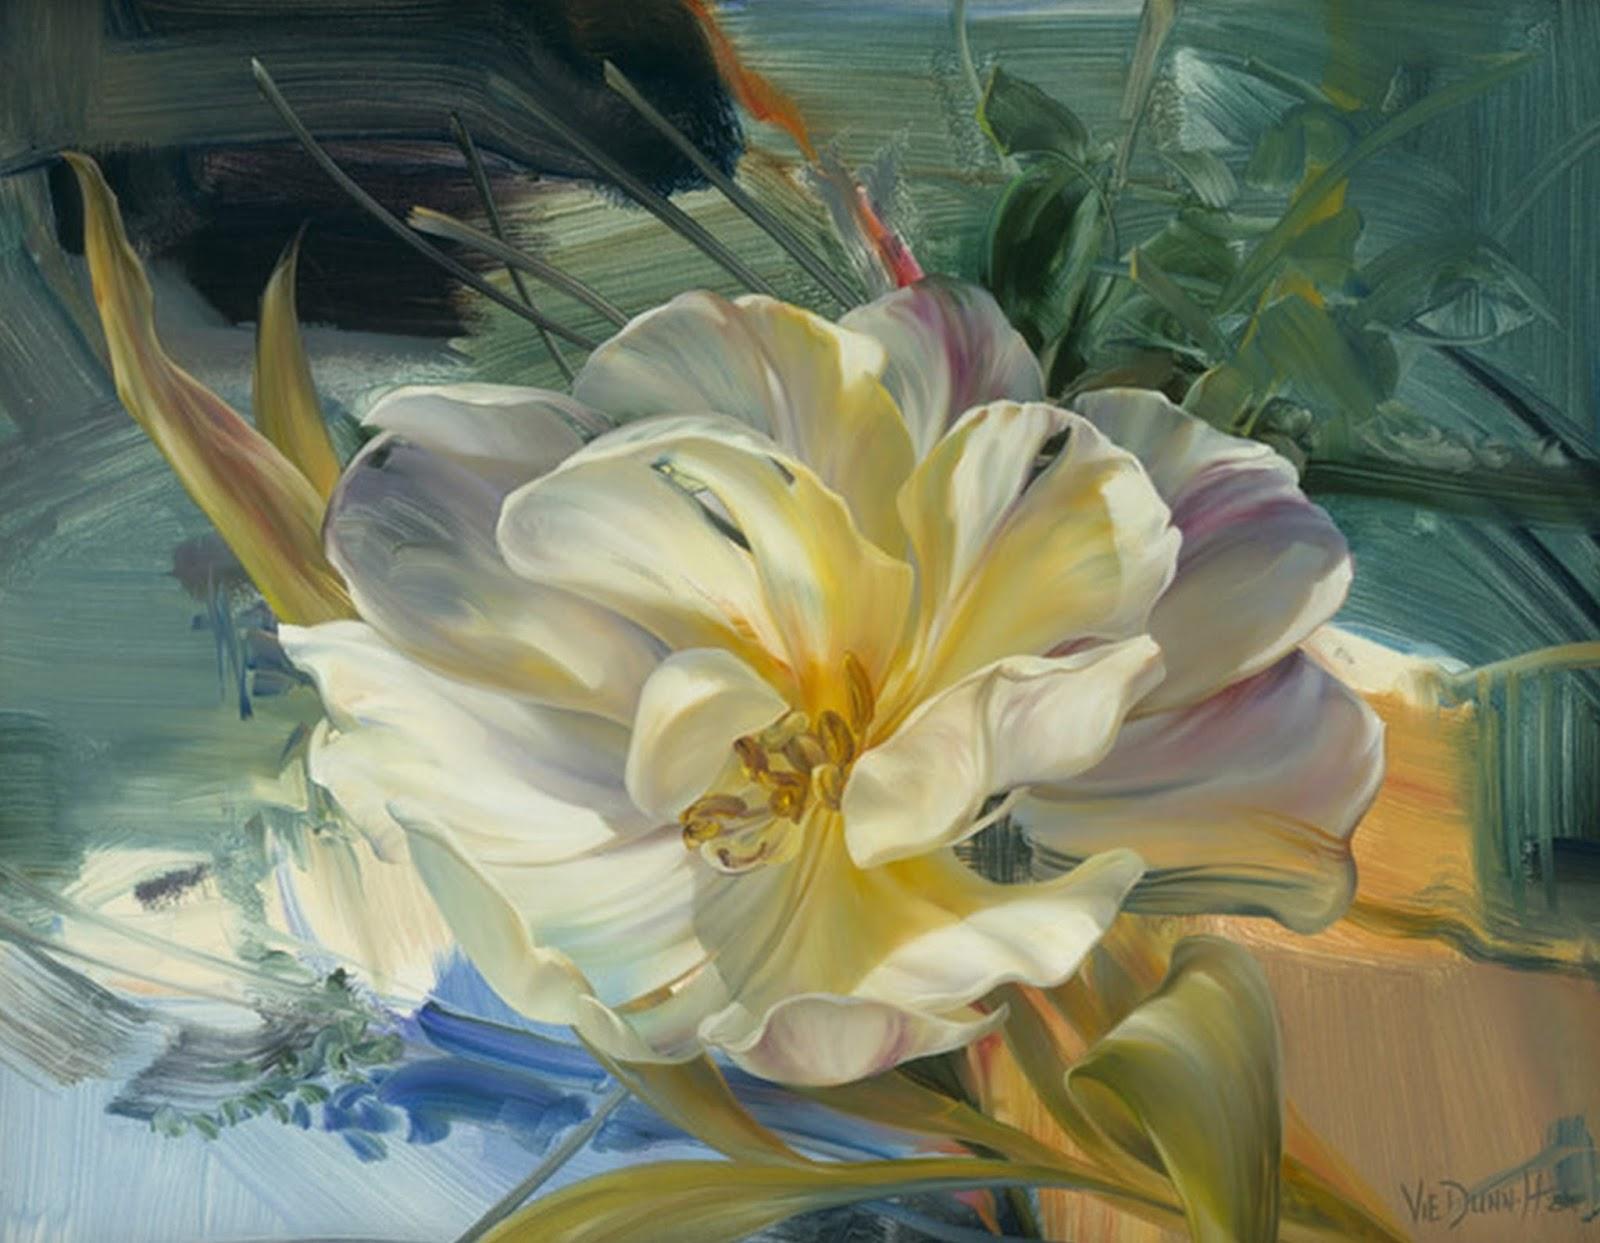 Cuadros al oleo de flores abstractas imagui for Cuadros de oleo modernos